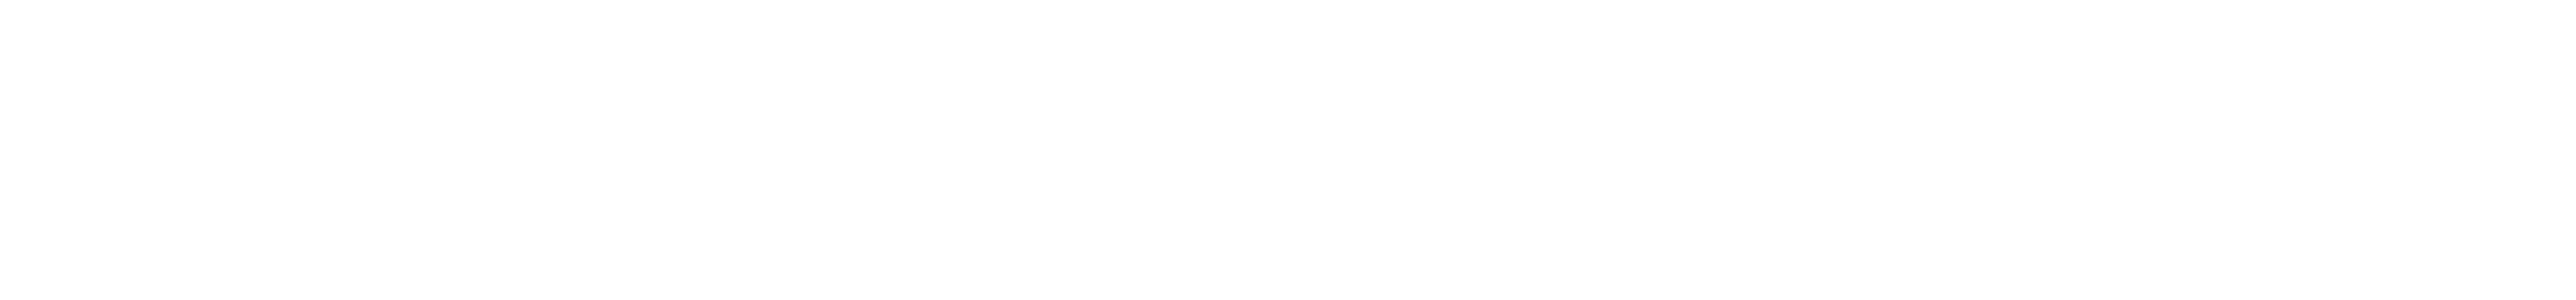 gloabal-inclusion-logo-white